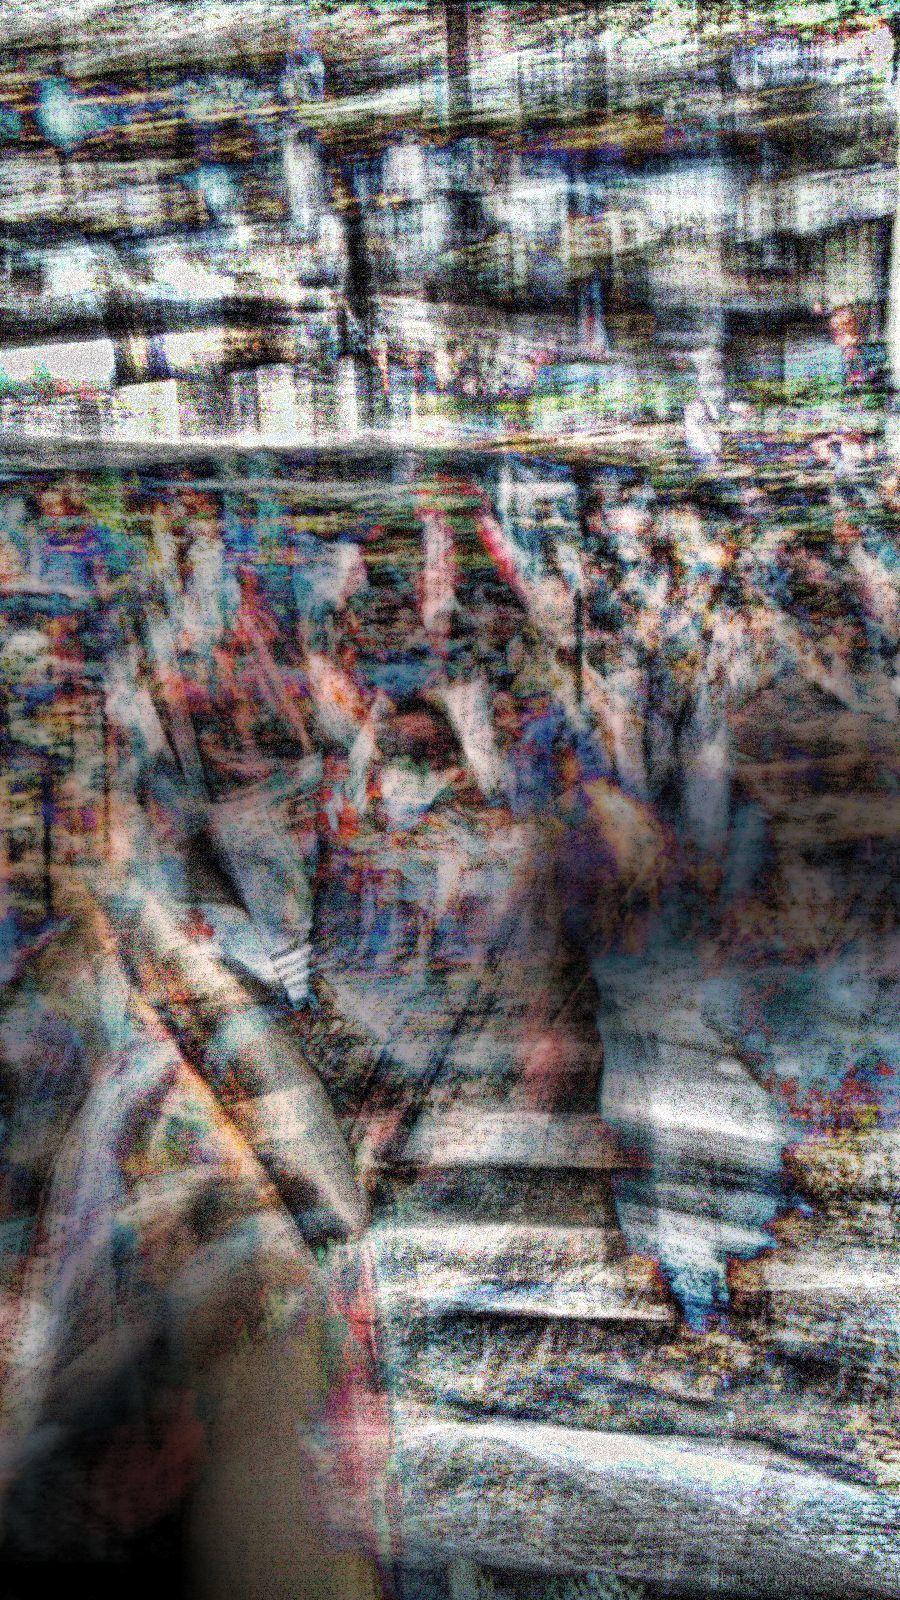 Double long exposure photomanipulation experiment.